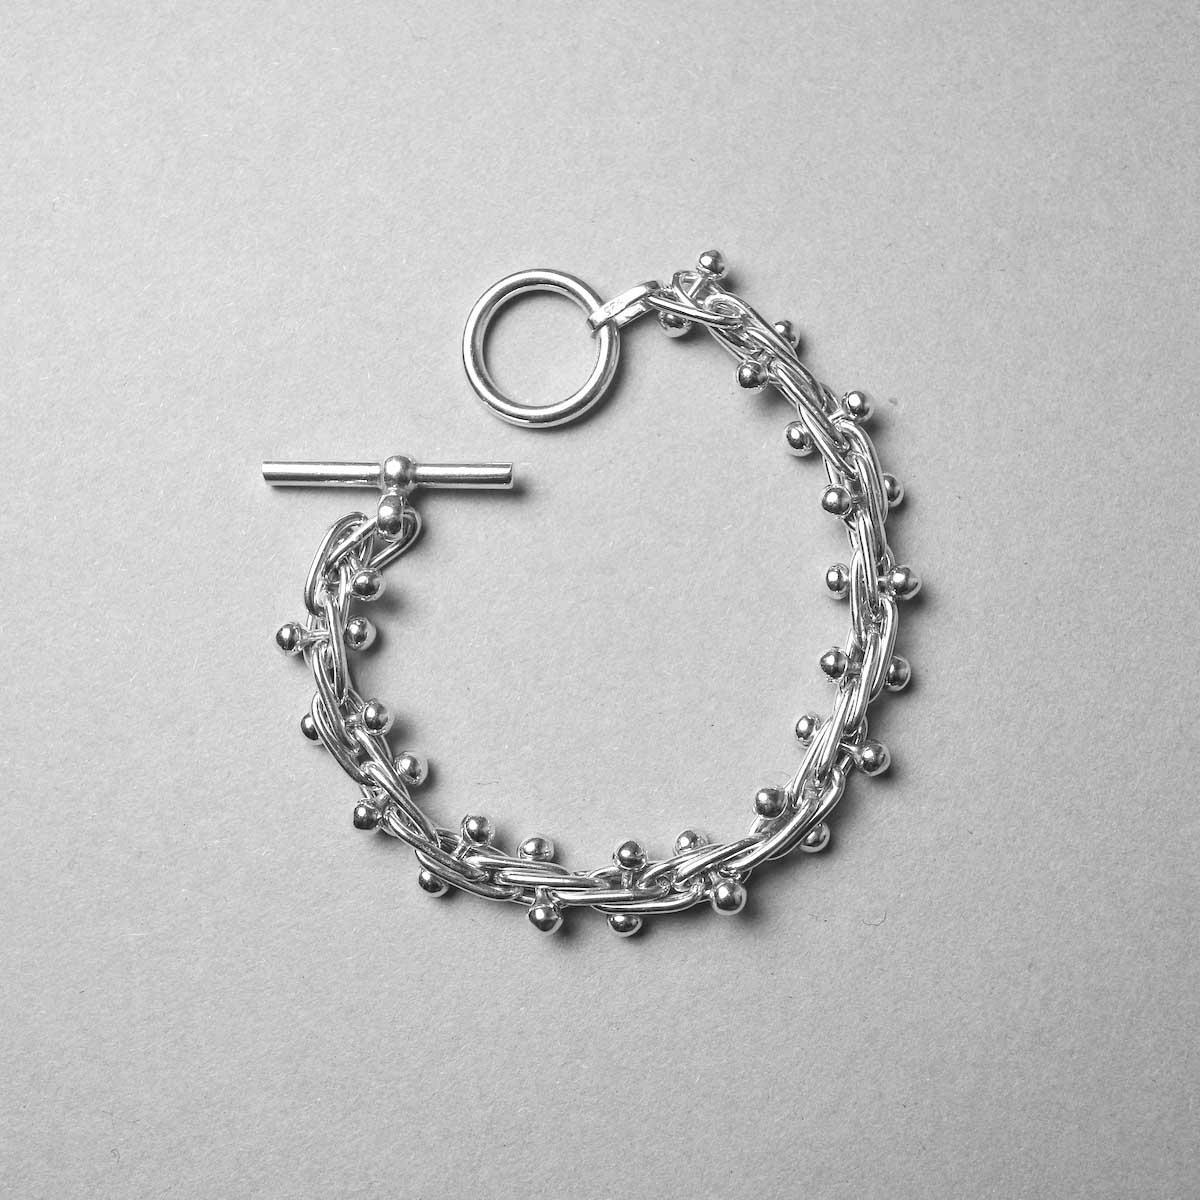 FIFTH SILVER / Silver Beaded Bracelet / Medium